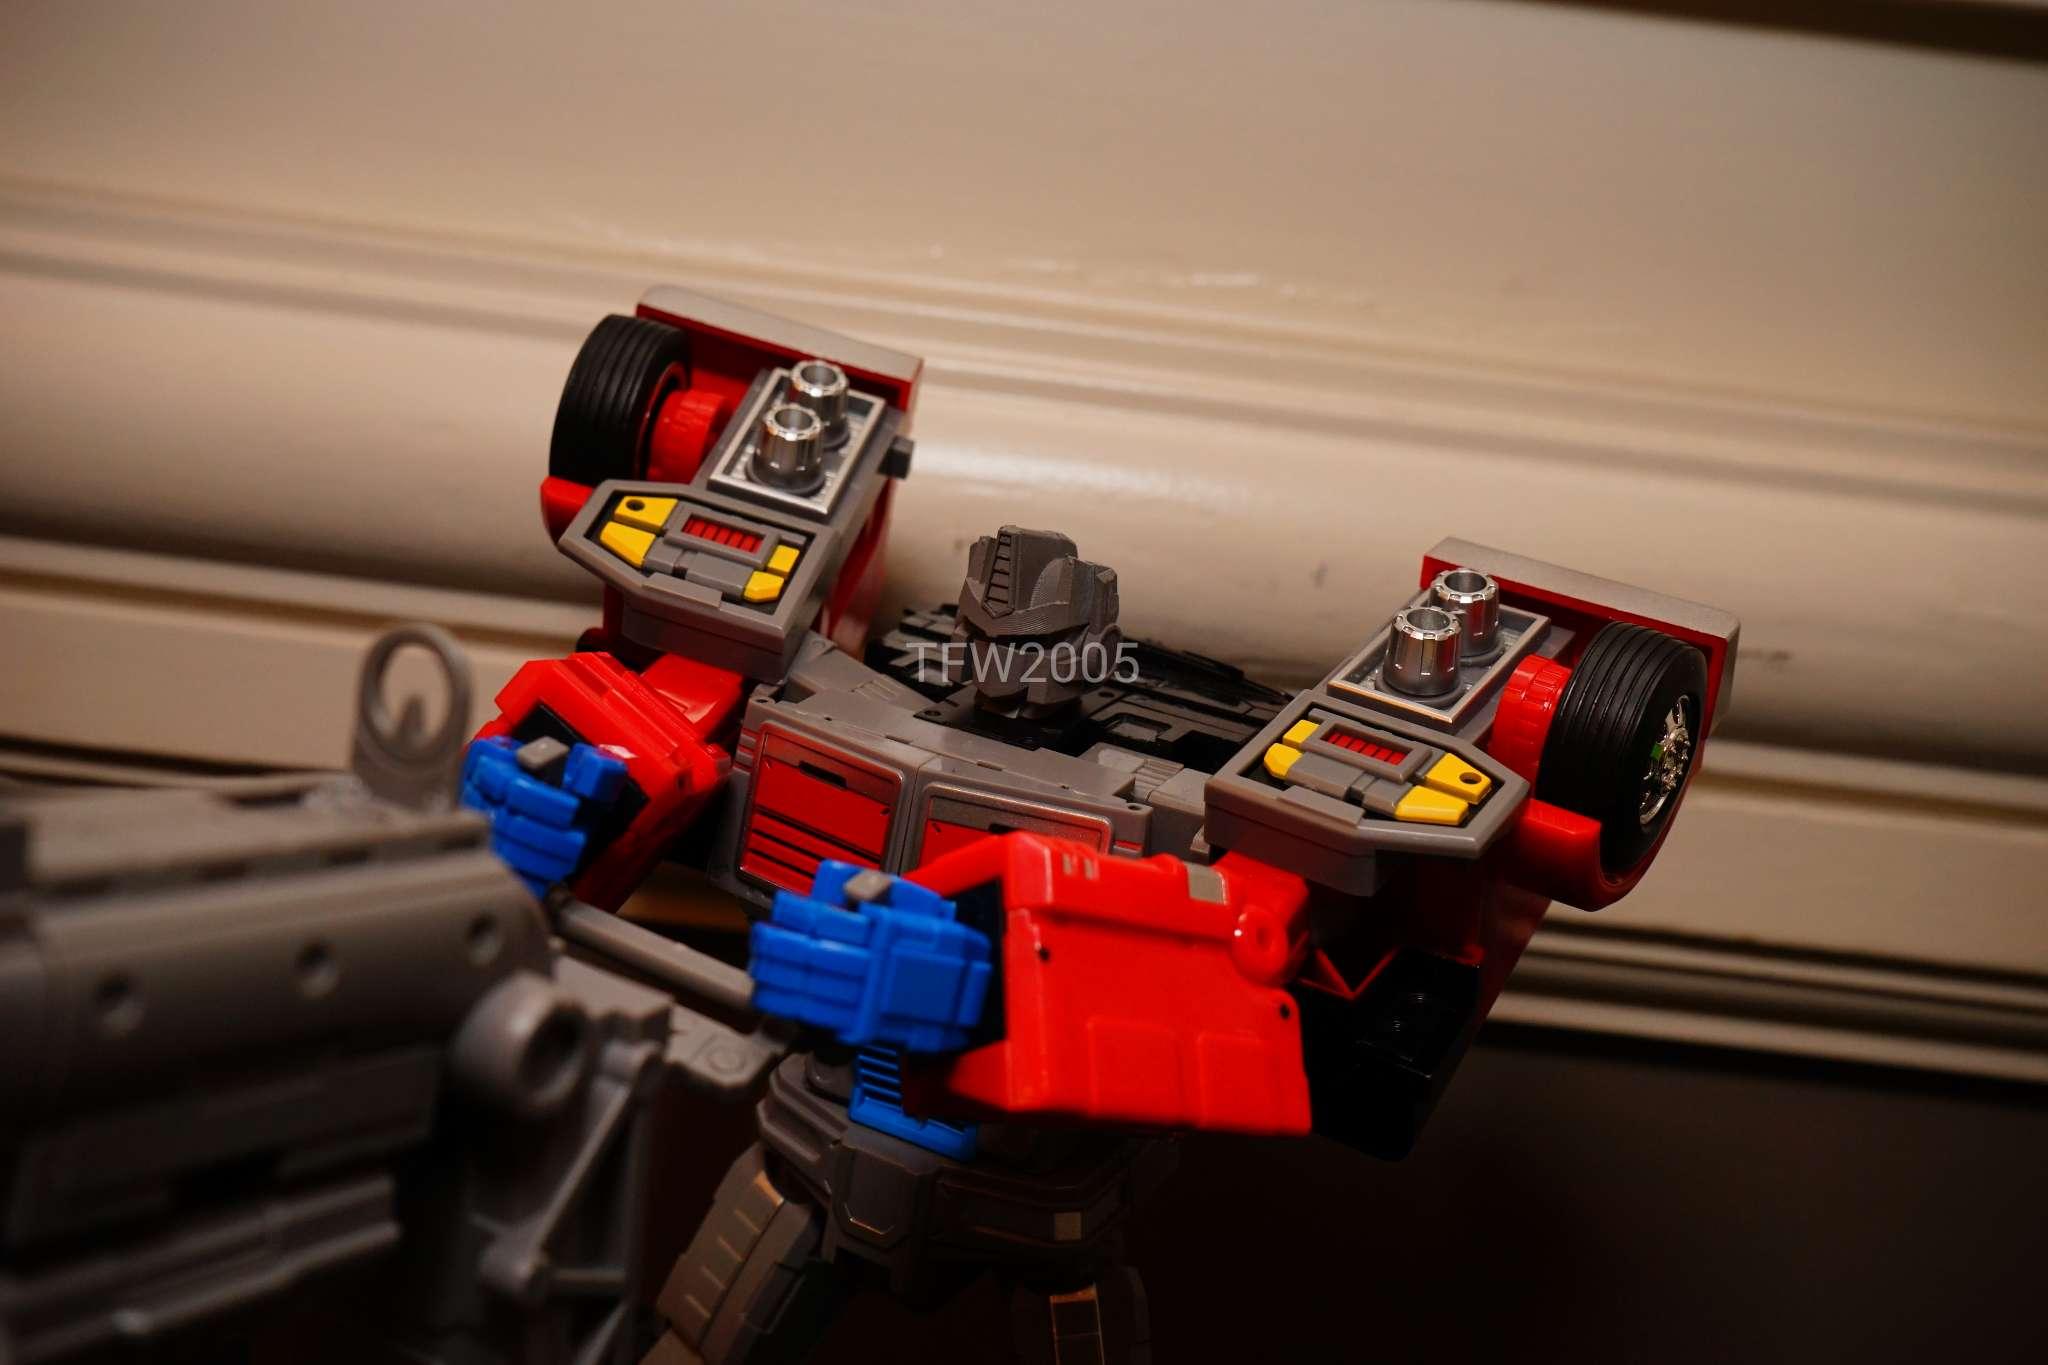 [FansHobby] Produit Tiers - Master Builder MB-01 Archenemy (aka Scourge RID 2000),  MB-04 Gunfighter II (aka Laser Optimus G2) et MB-09 Trailer (remorque) - Page 2 RERDr06p_o